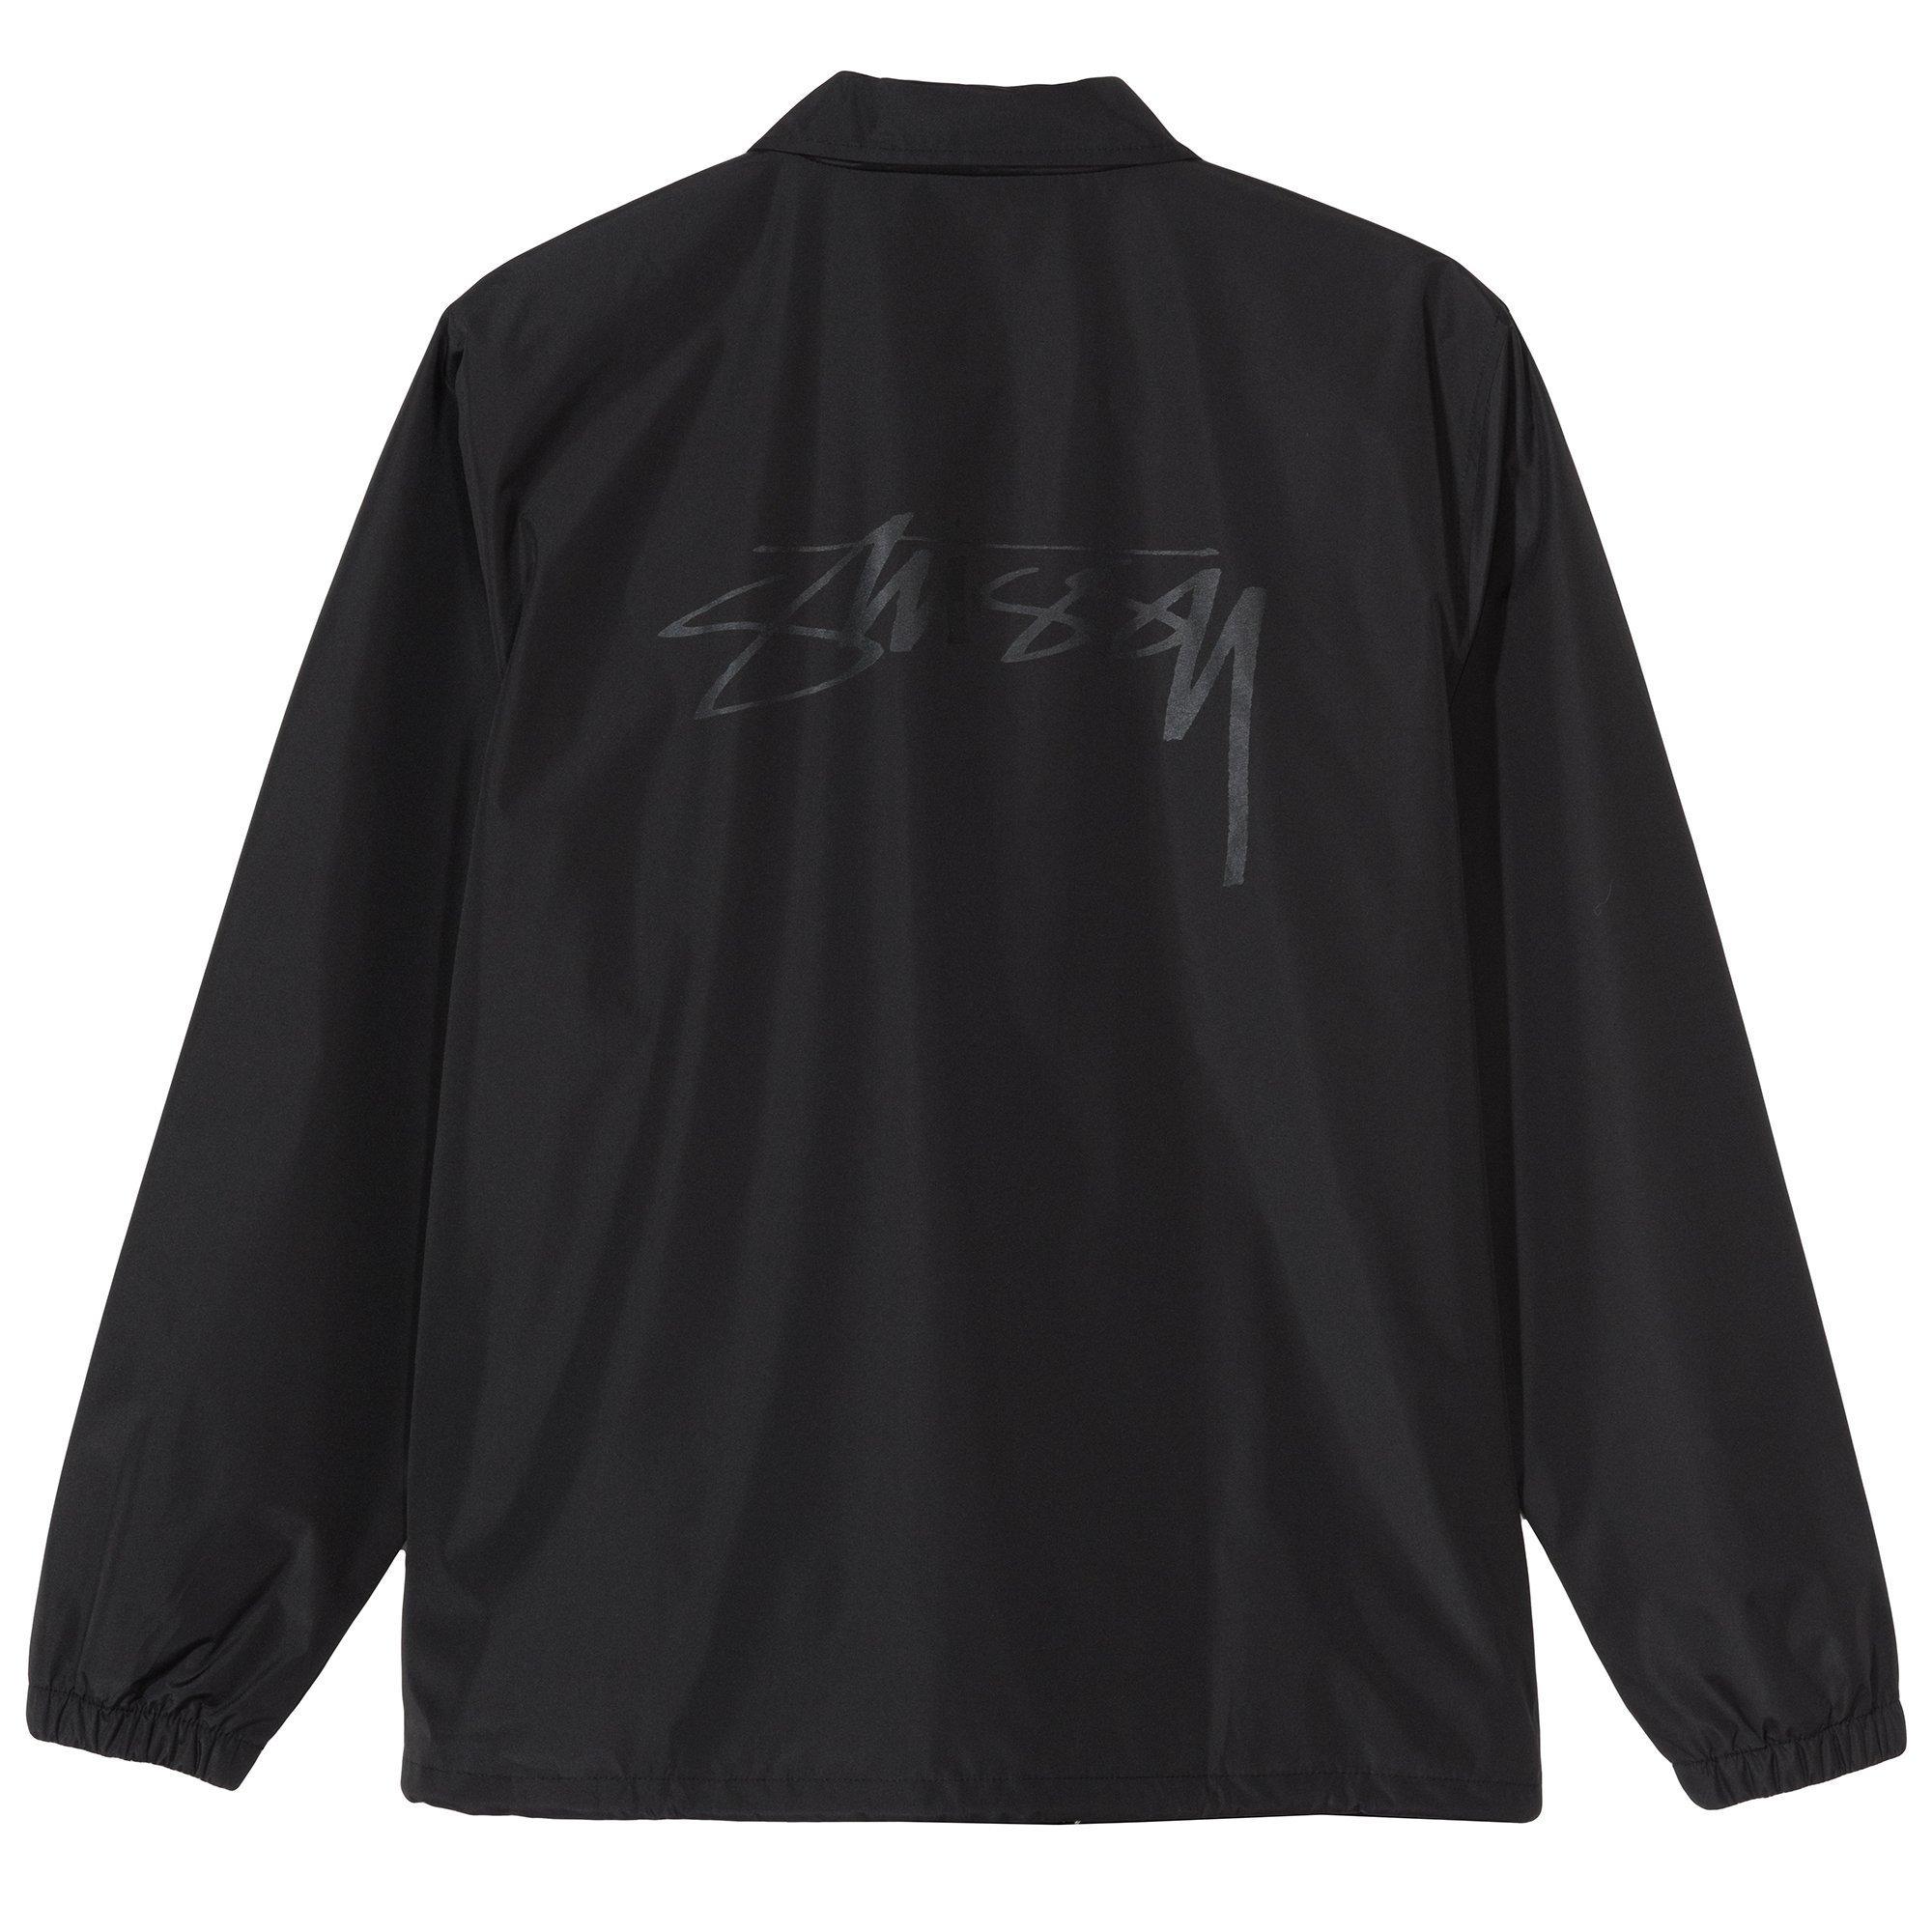 STÜSSY | Cruize Coach Jacket (Black)